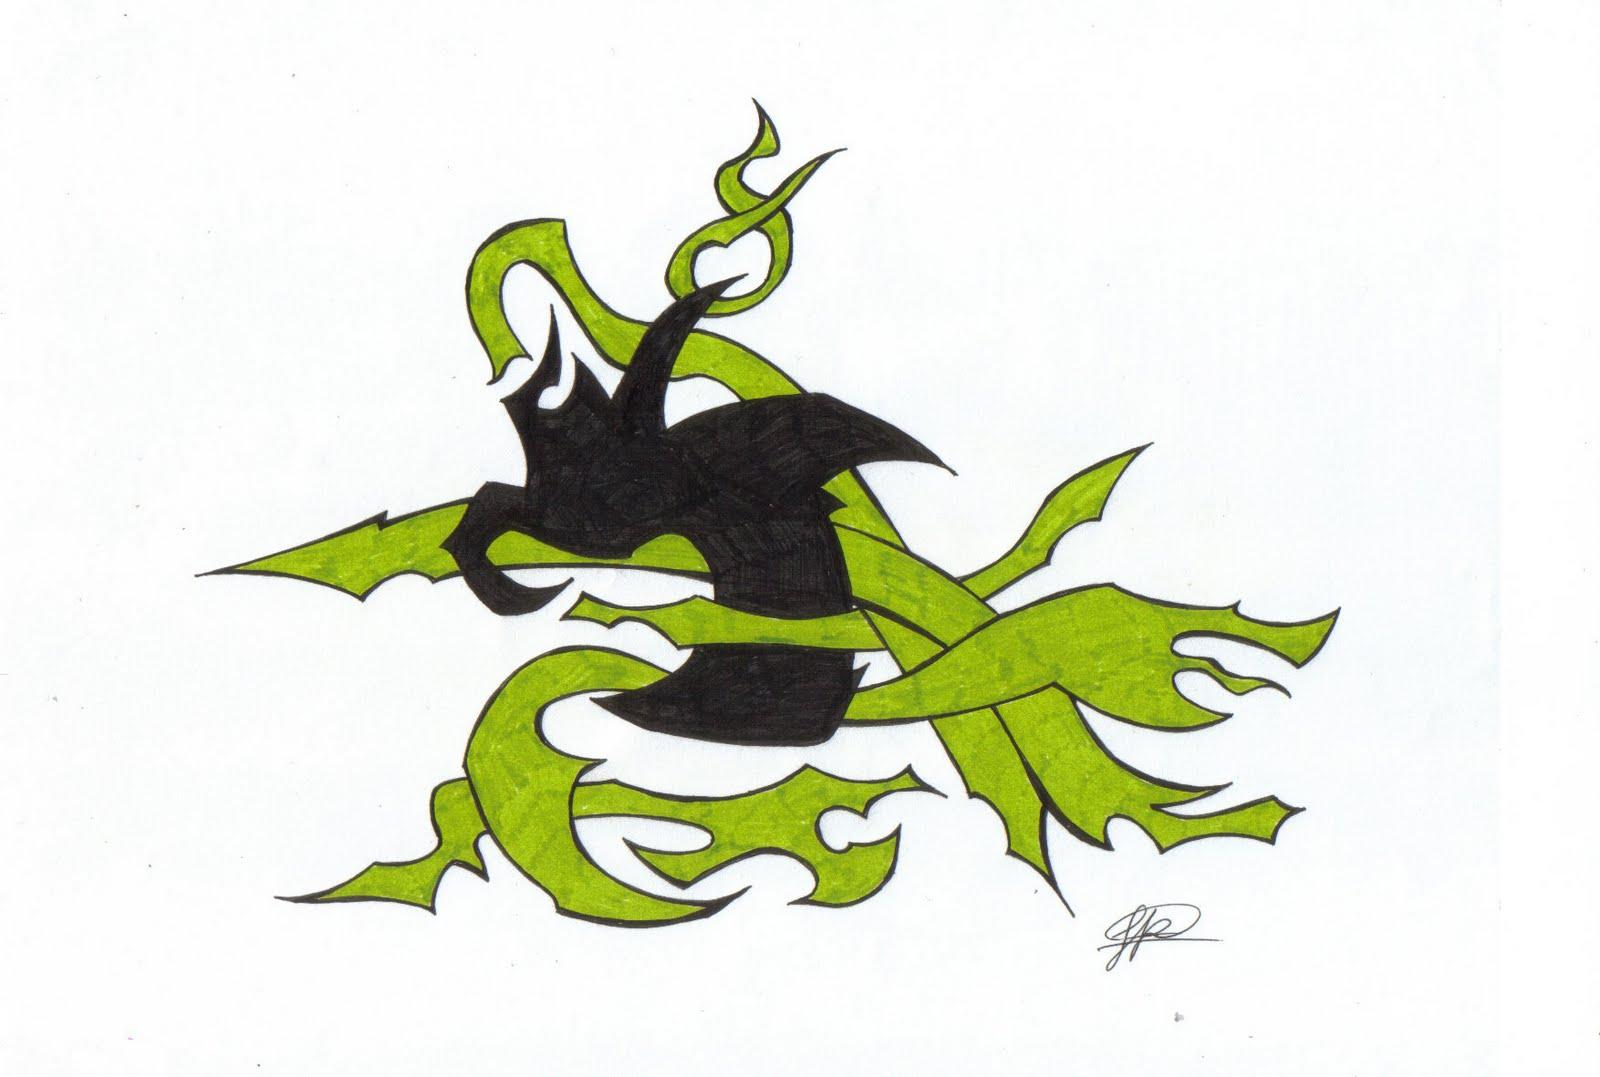 Arte Irregular: Lazos verdes